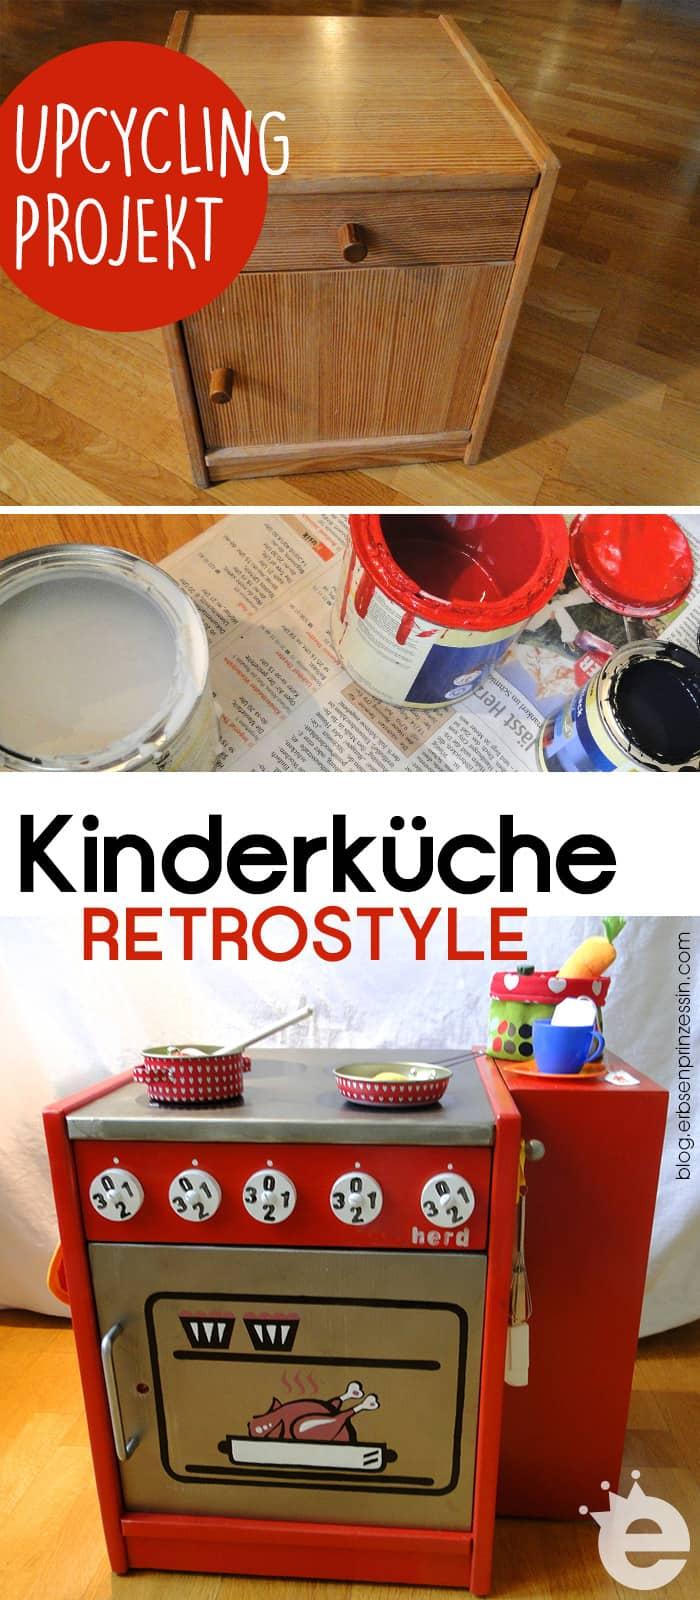 Möbel-Upcycling-Projekt: Kinderküche im Retrostil selber bauen. Schrank-Upcycling